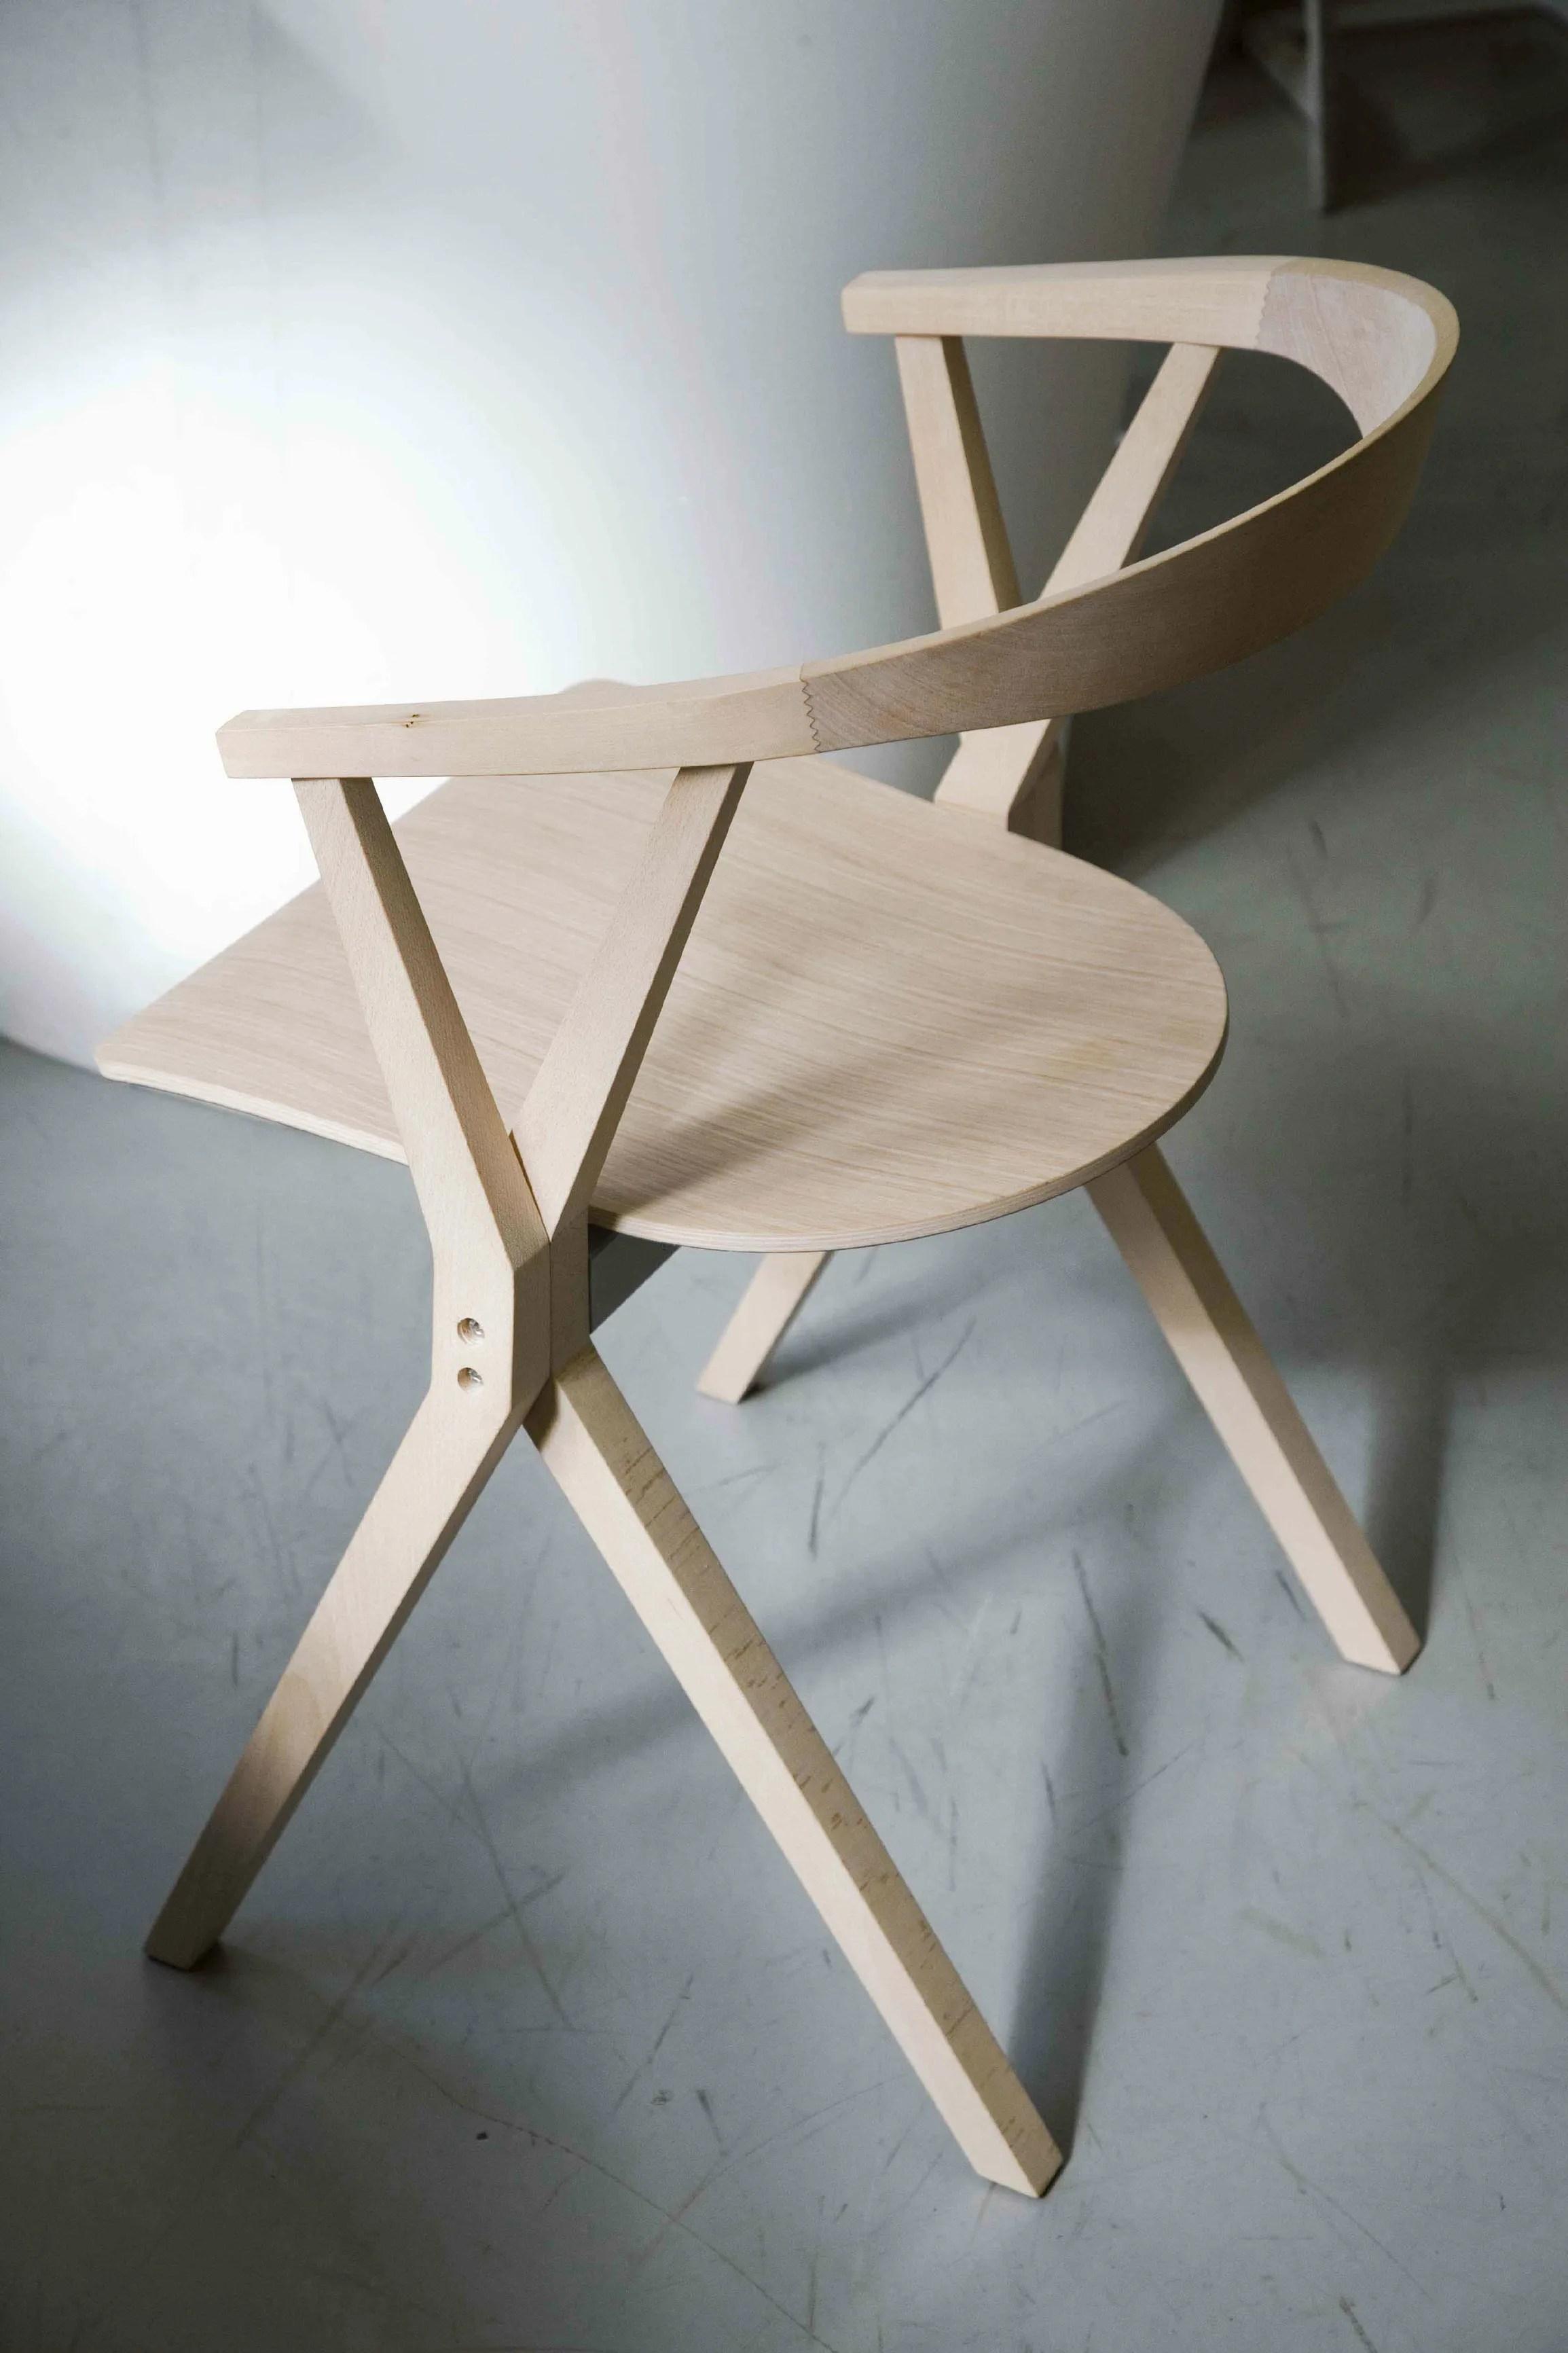 chair design bd cover rentals pensacola fl b by barcelona konstantin grcic